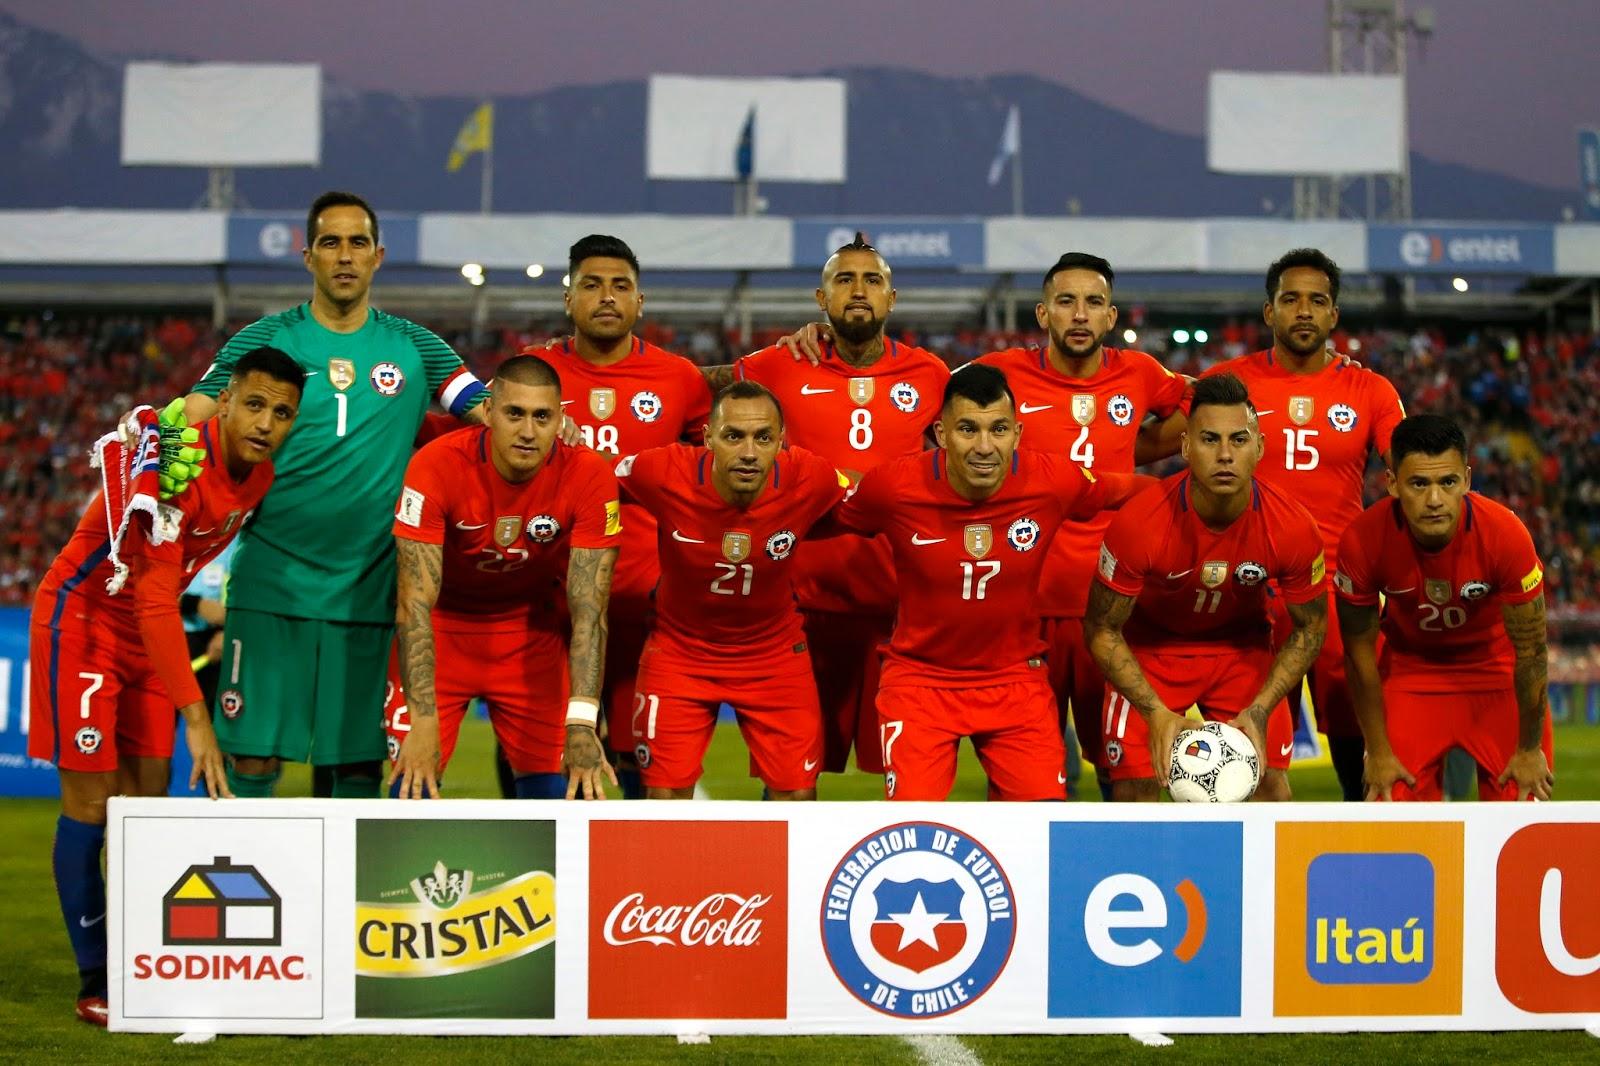 Formación de Chile ante Paraguay, Clasificatorias Rusia 2018, 31 de agosto de 2017